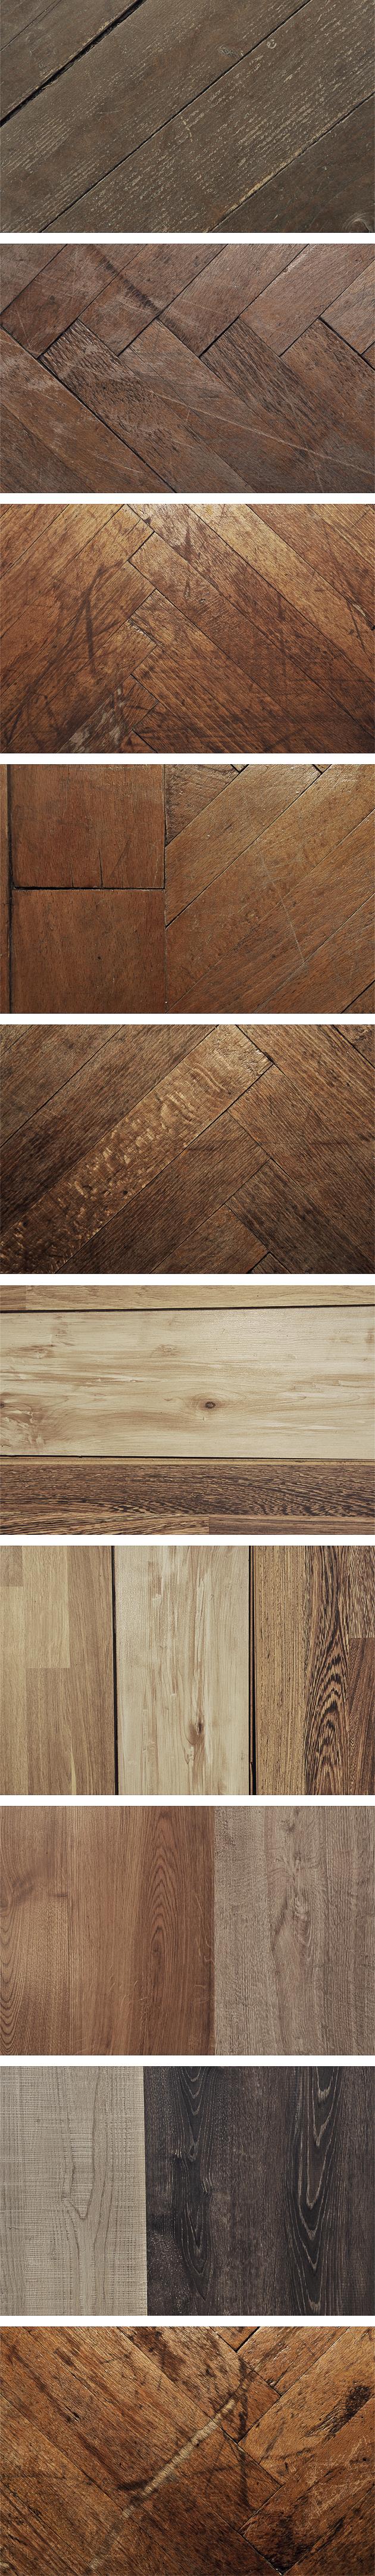 designtnt-textures-wood-flooring-large